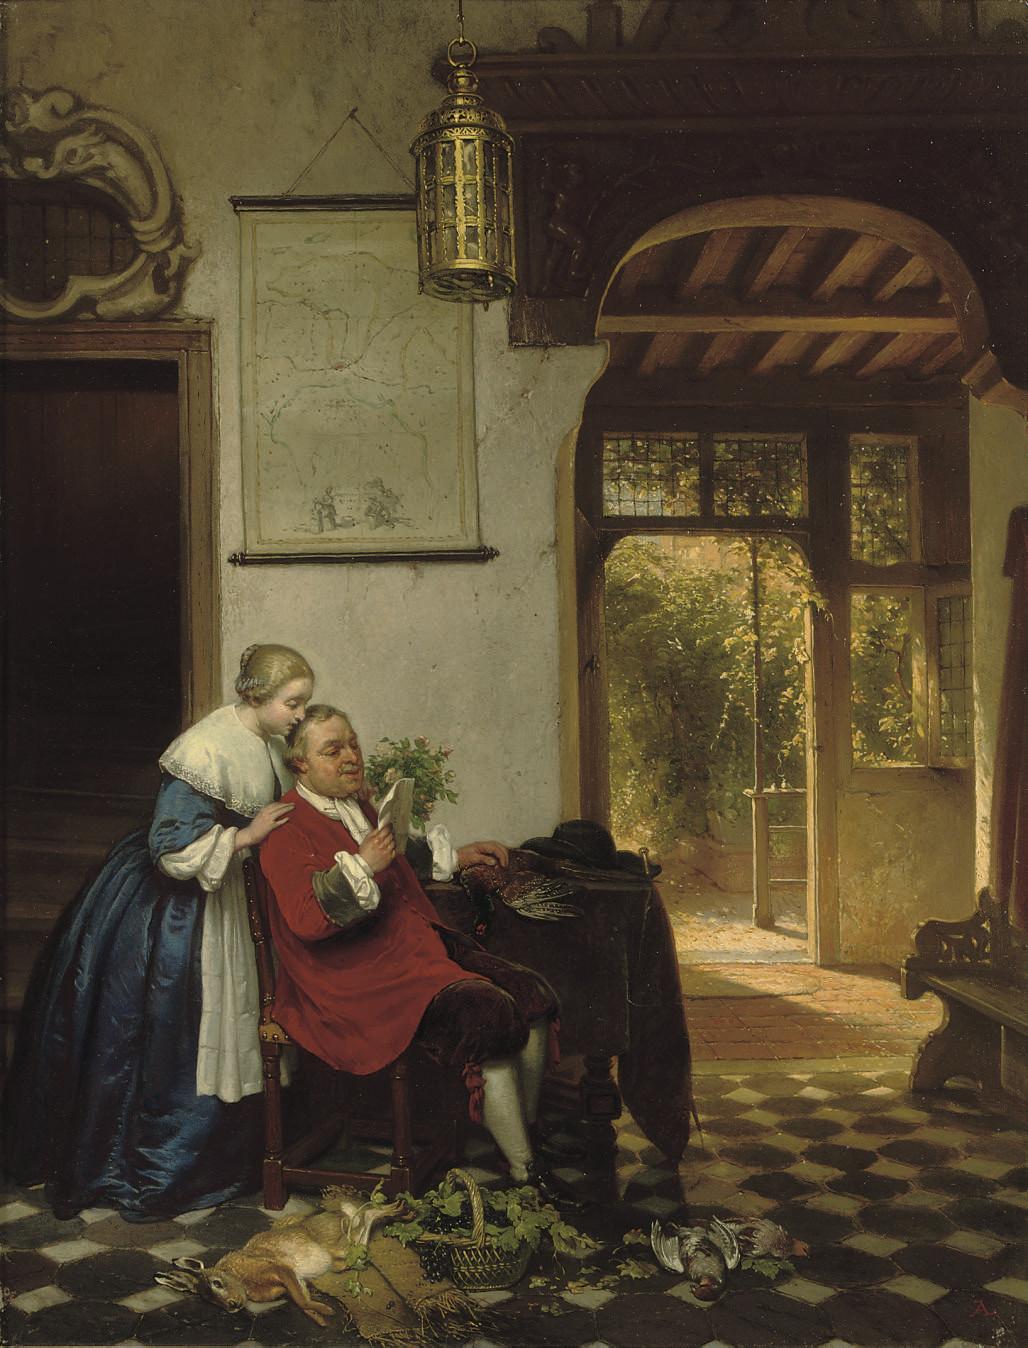 Ary Johannes Lamme (Dordrecht